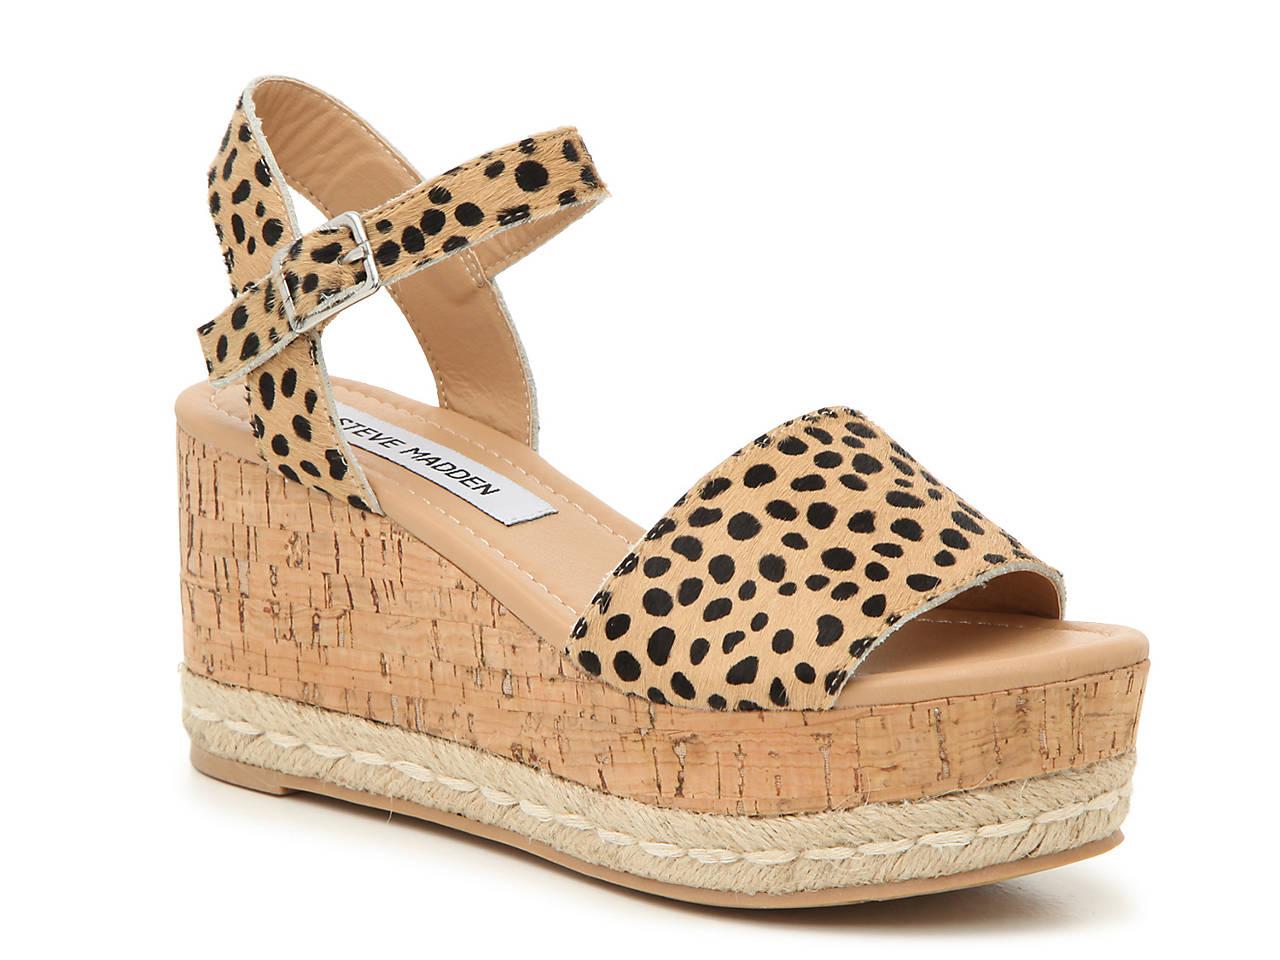 be4aef7b2194 Steve Madden Prima Espadrille Wedge Sandal Women s Shoes